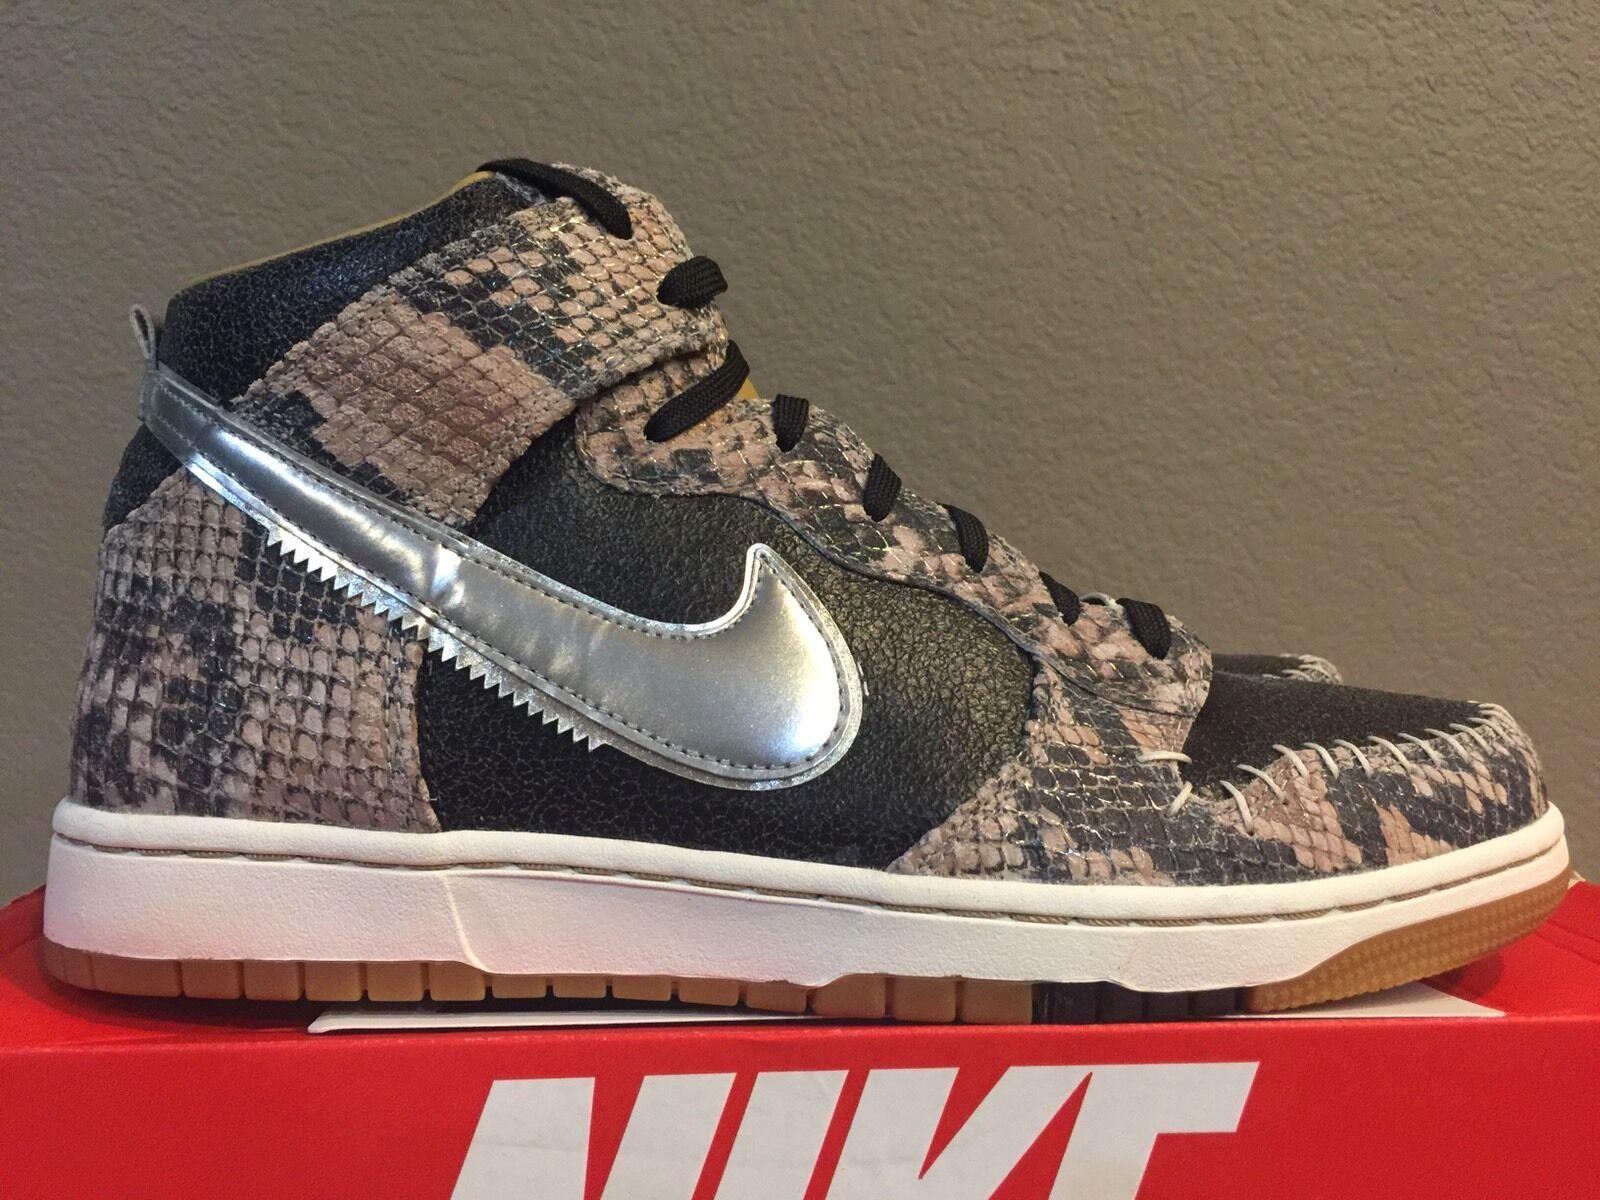 Nike Dunk CMFT PRM QS [716714-001] Snakeskin Black Silver-Sail Size 10.5